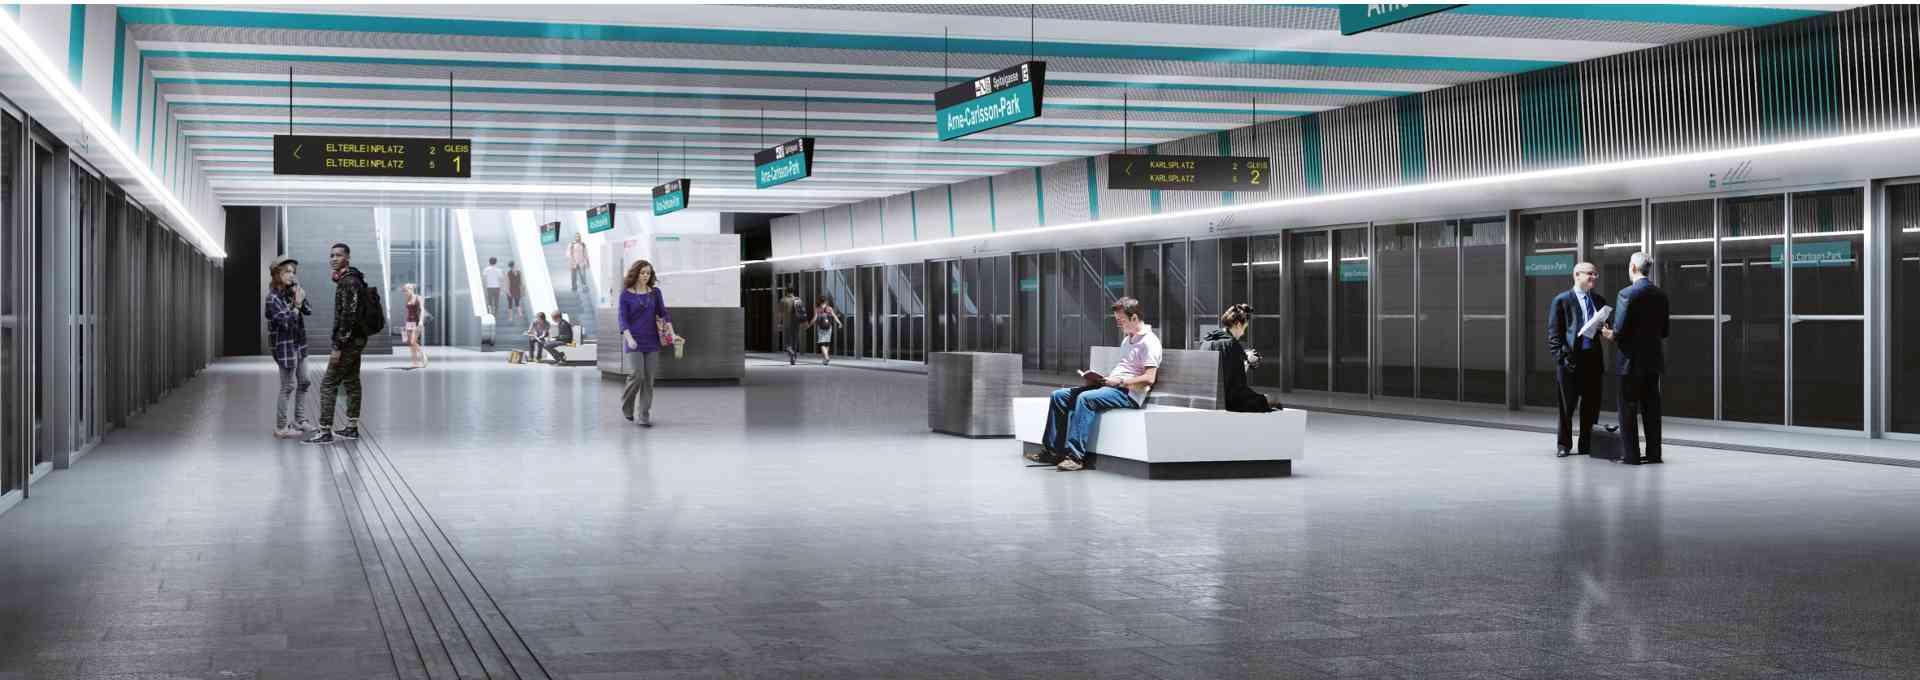 U5-Station Arne-Carlsson-Park